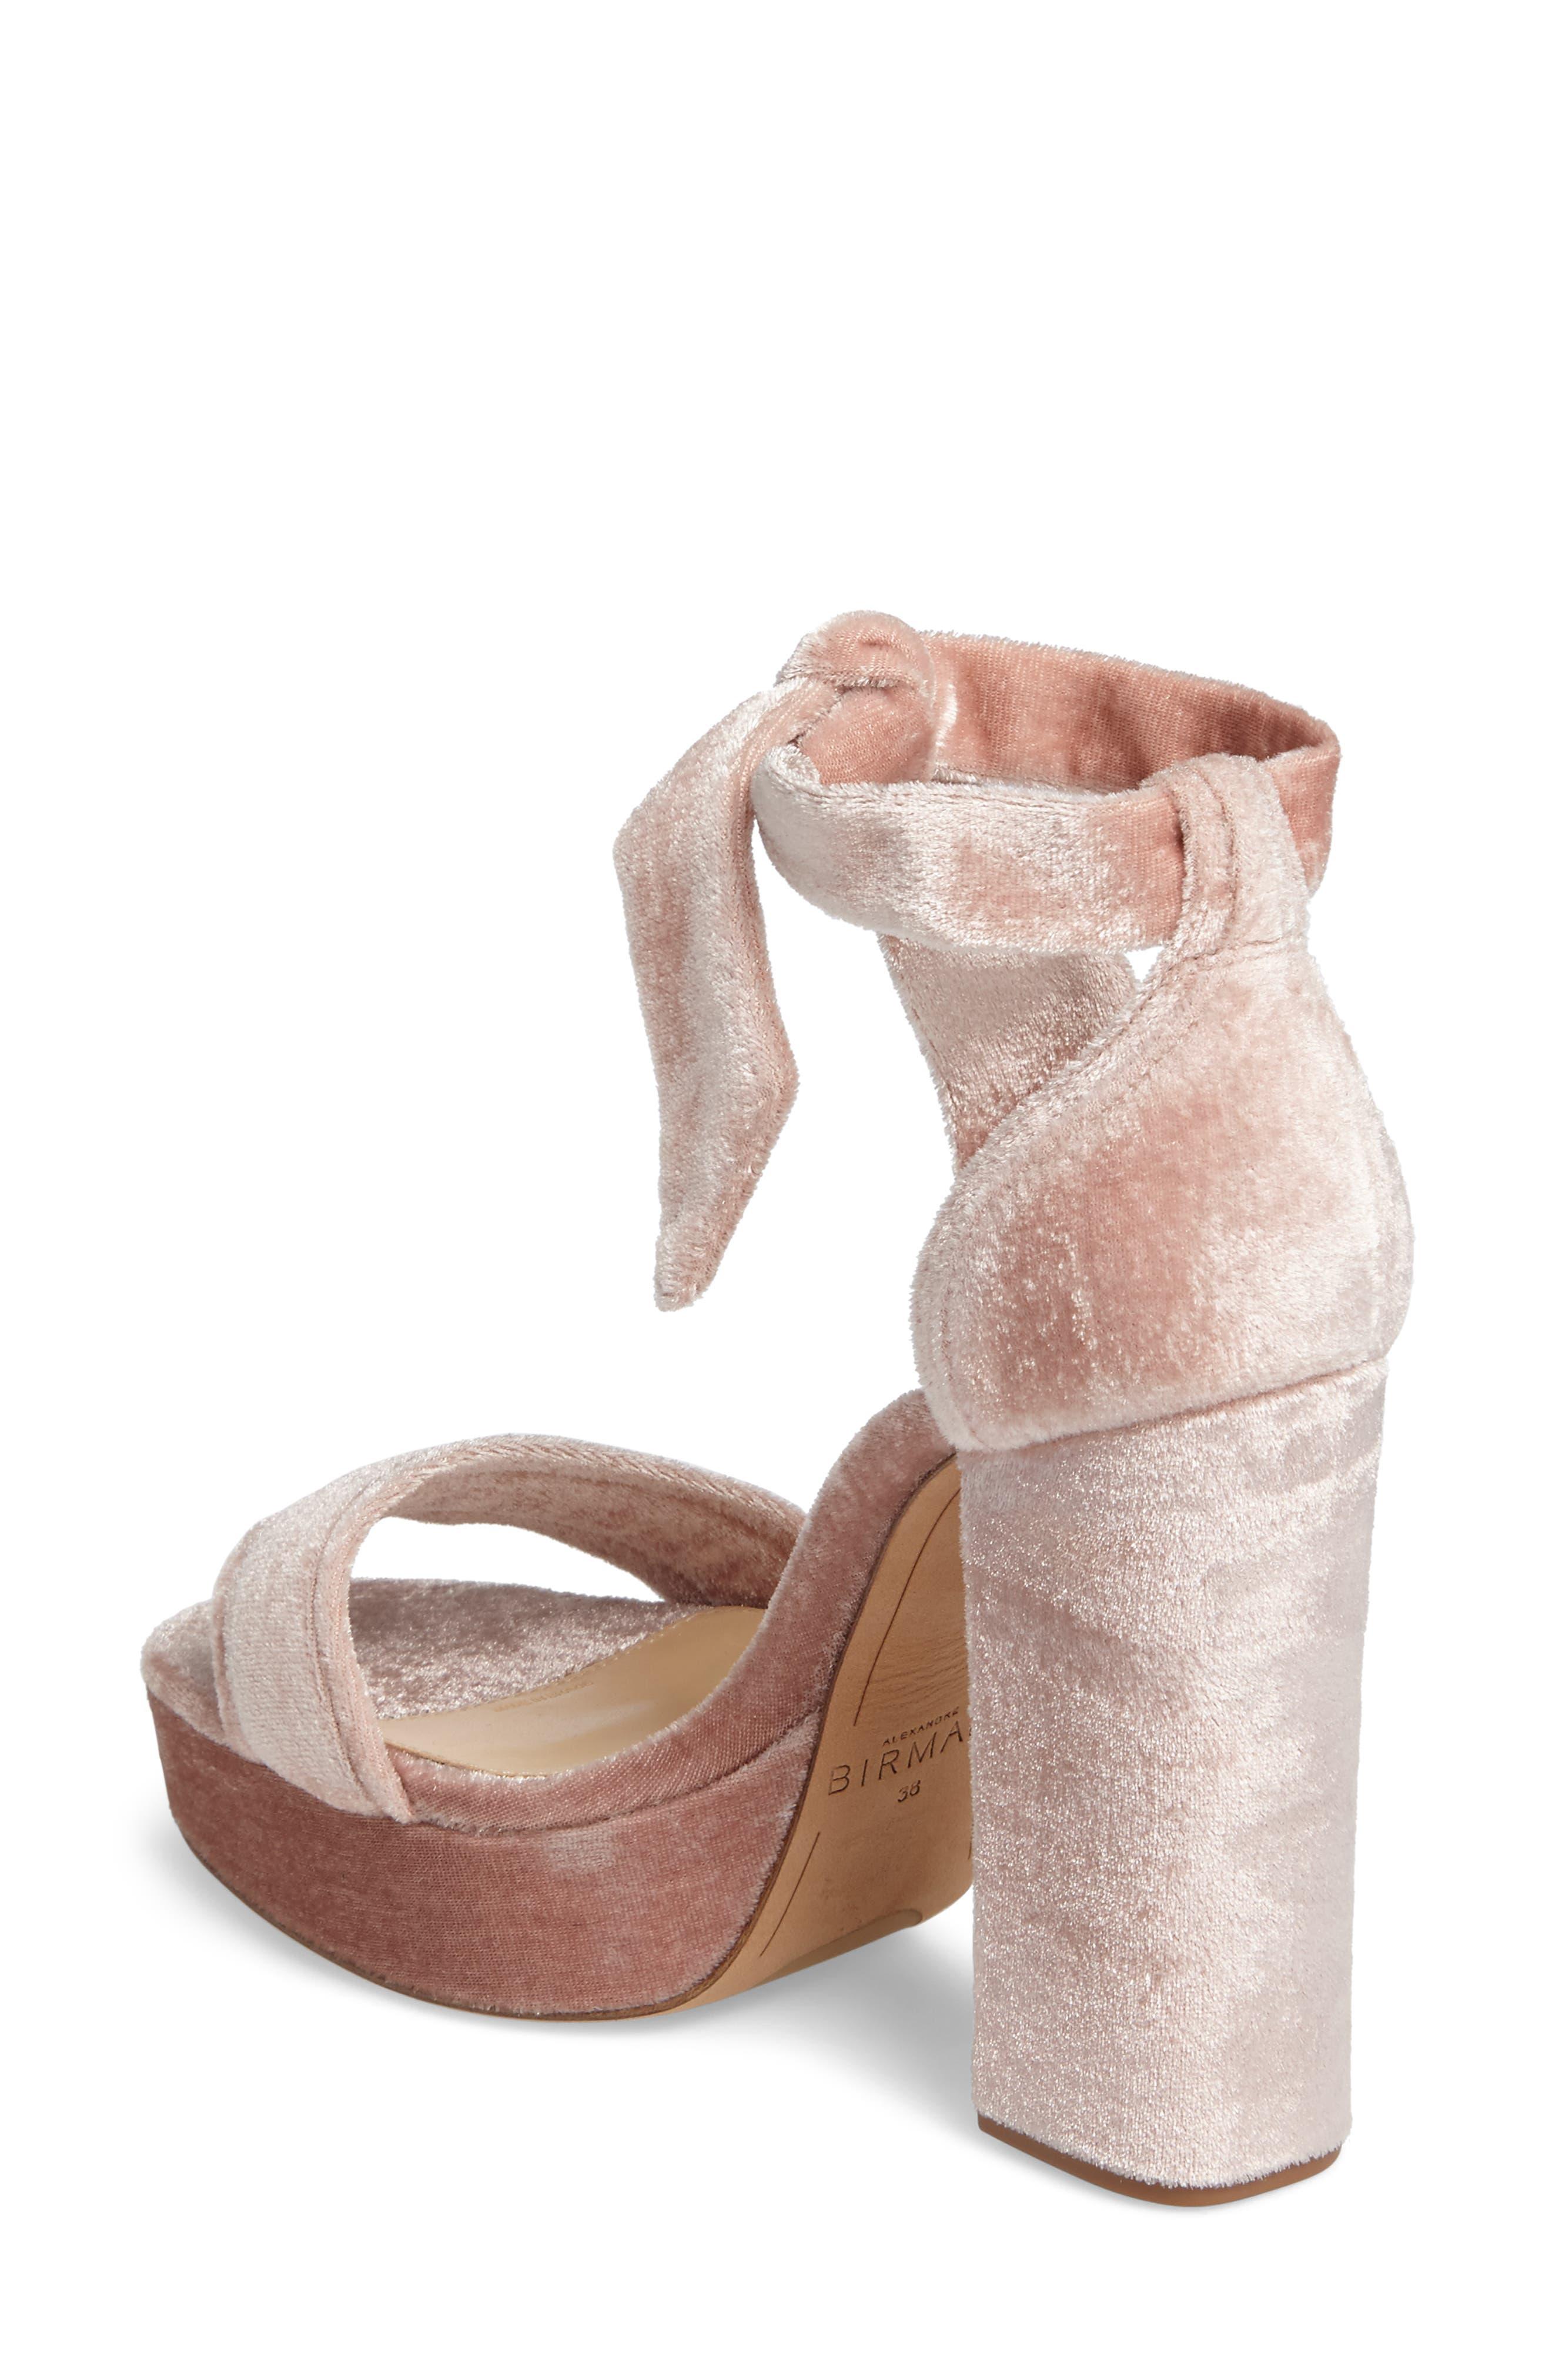 Celine Platform Sandal,                             Alternate thumbnail 2, color,                             Blush